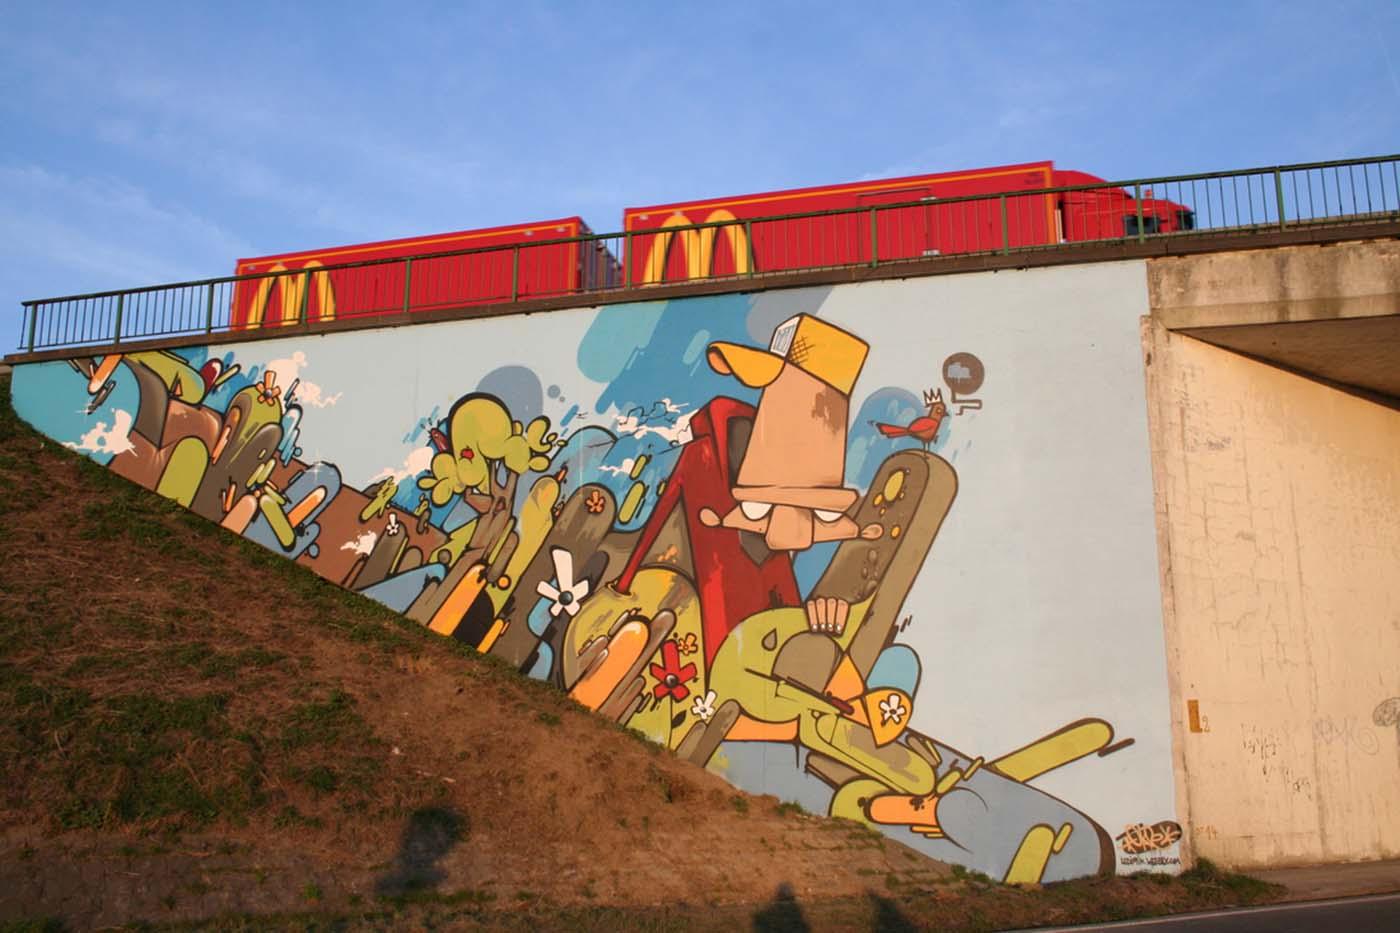 https://www.propaganza.be/wp-content/uploads/2019/04/lediptik-propaganza-urban-artist-graffiti-graff-street-art-spray-painting-belgique-2.jpg